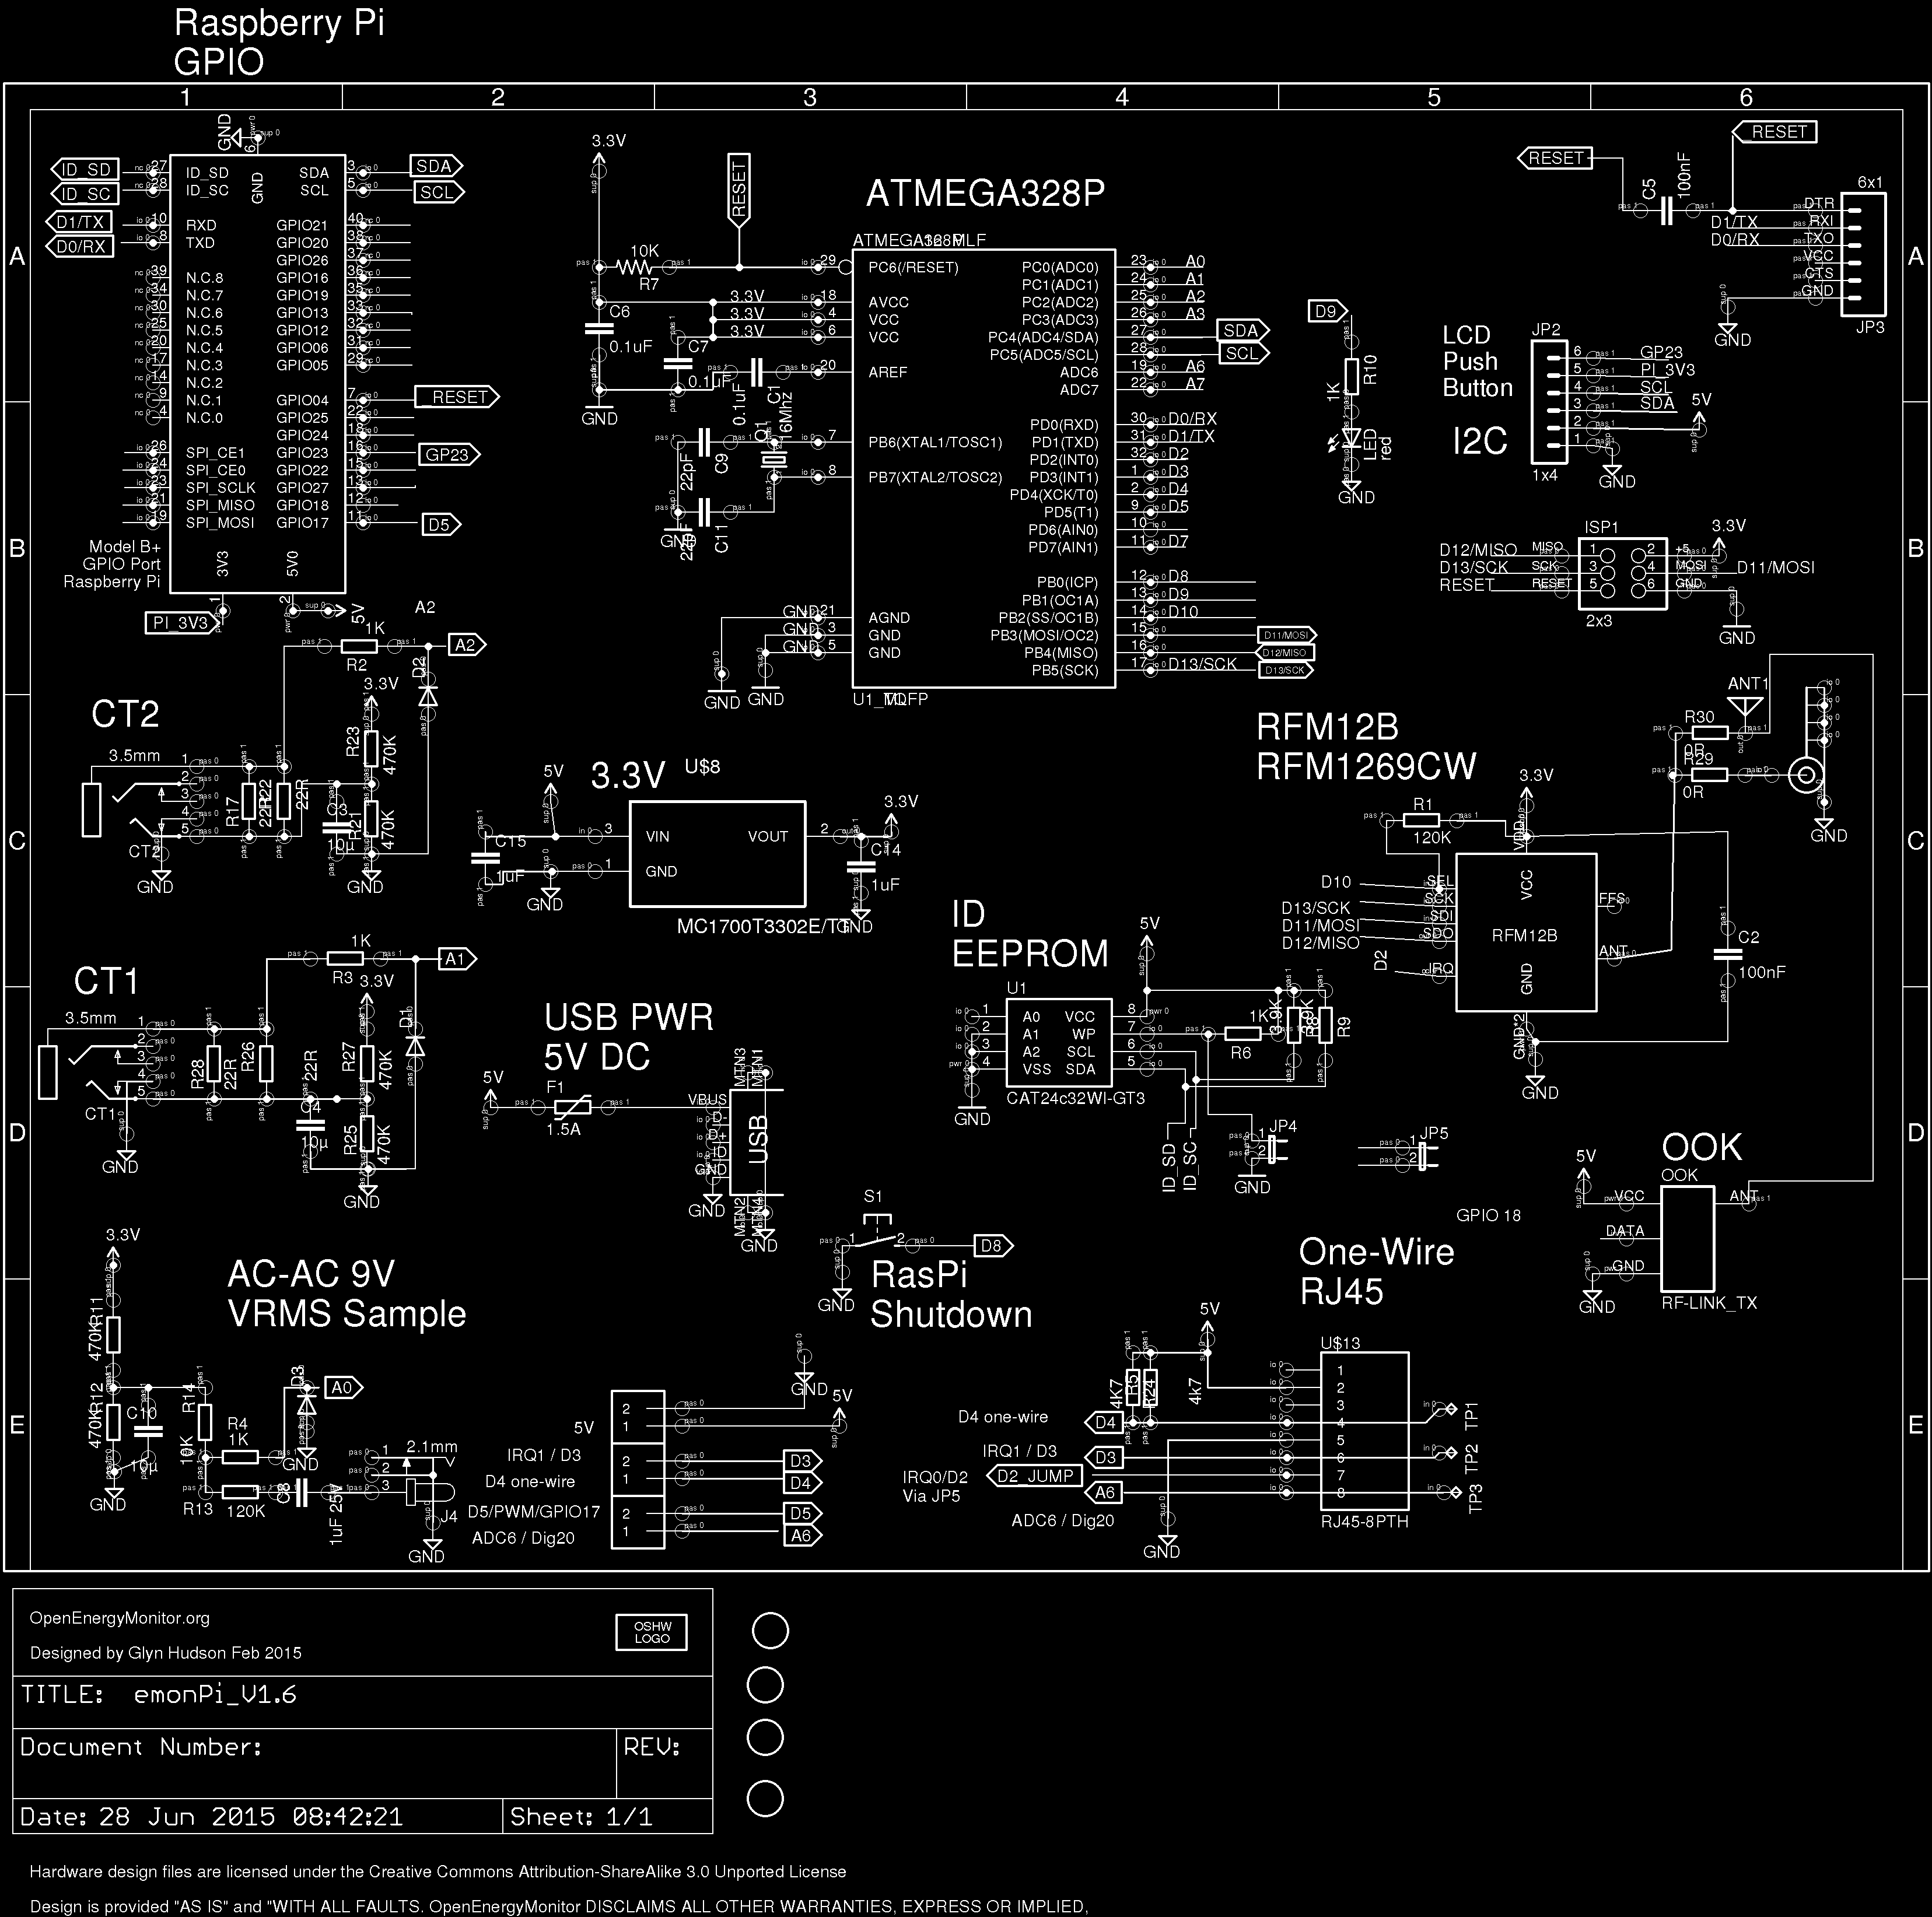 Problems recognising a temp sensor on emonPi - emonPi - Community